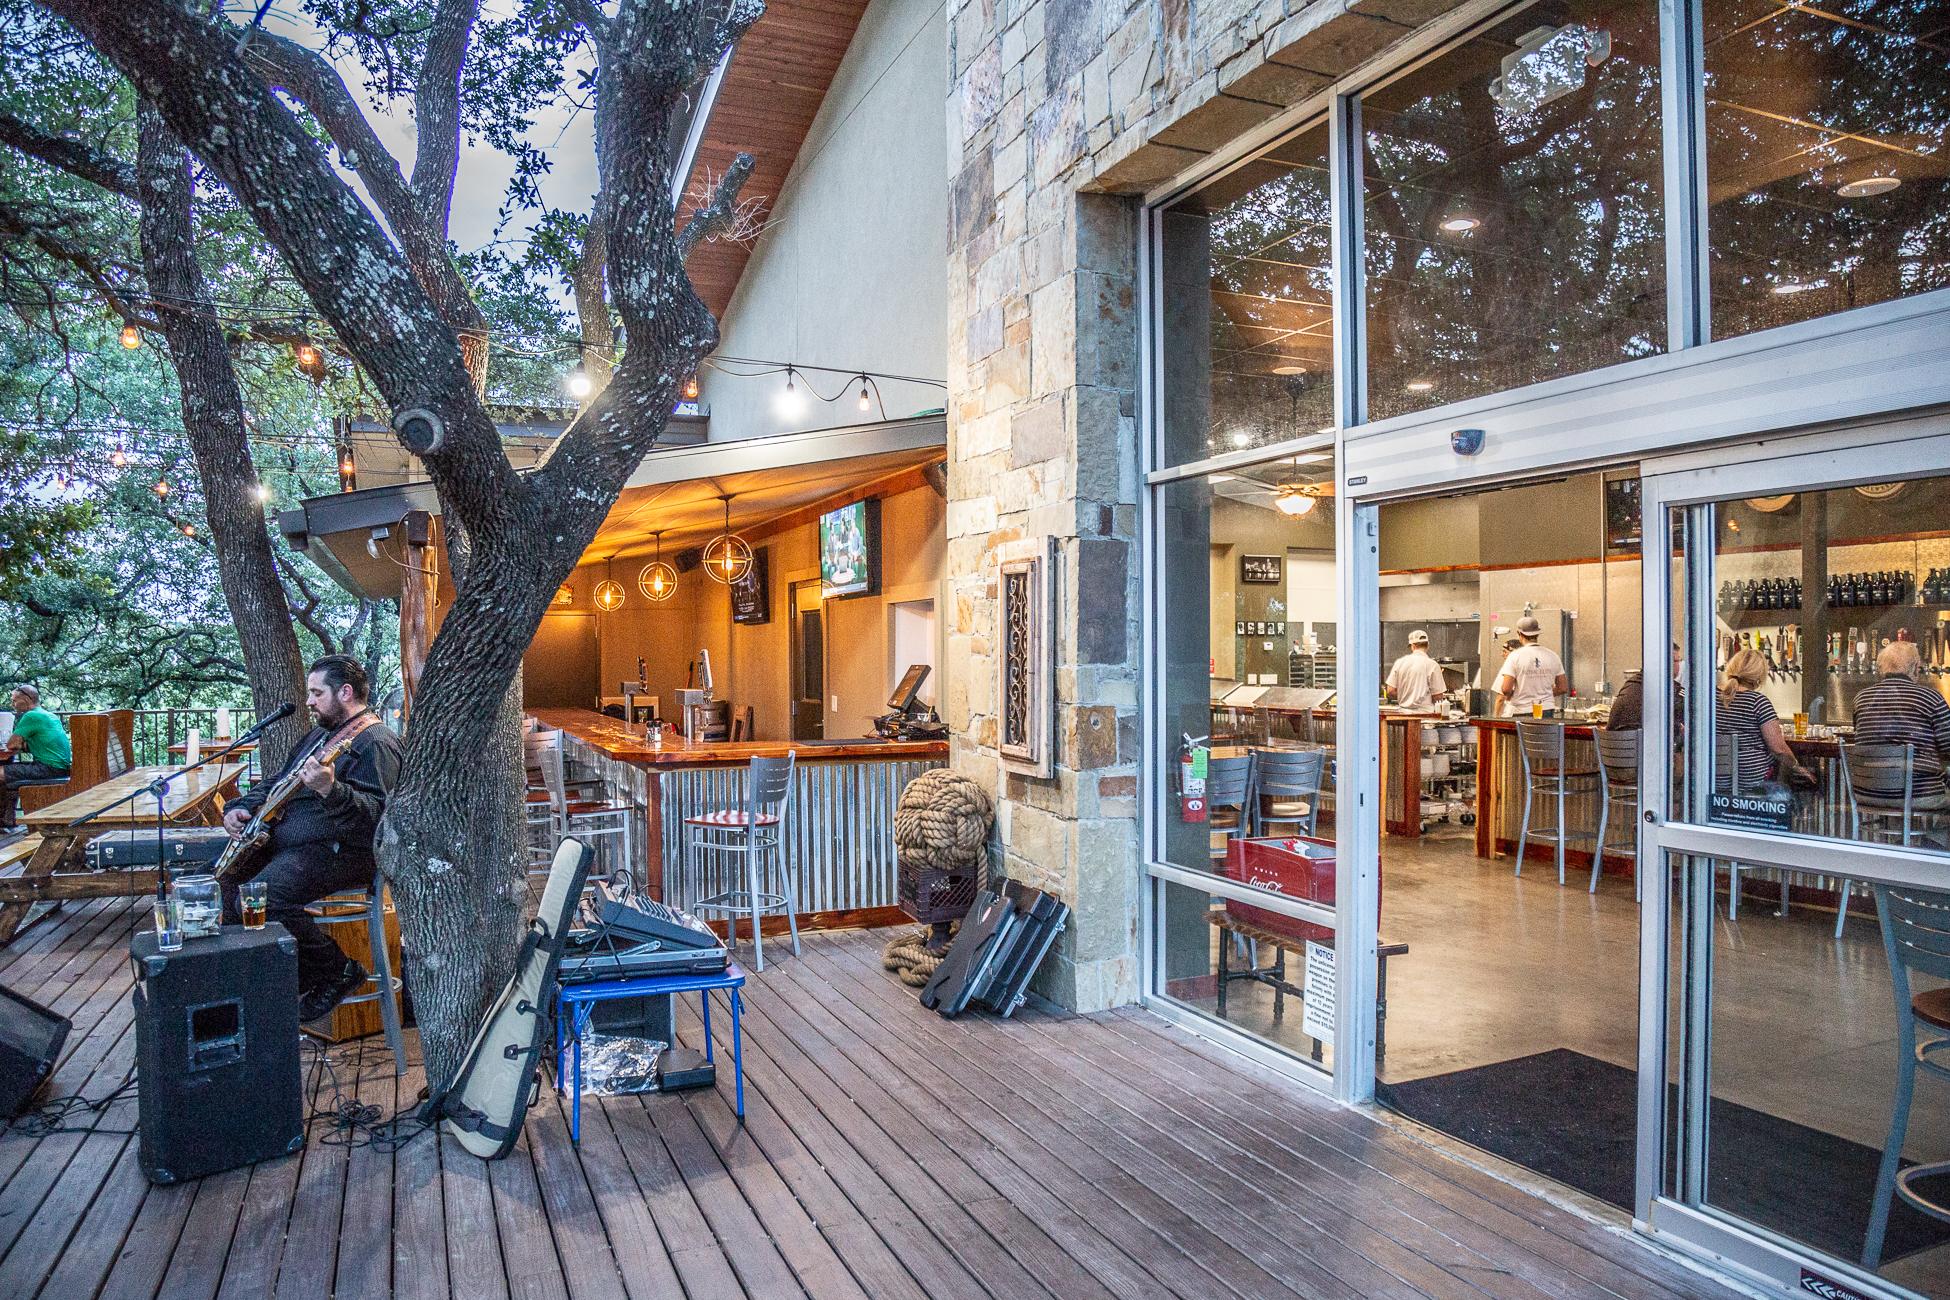 Hops & Thyme - Lake Travis Craft Beer Pub